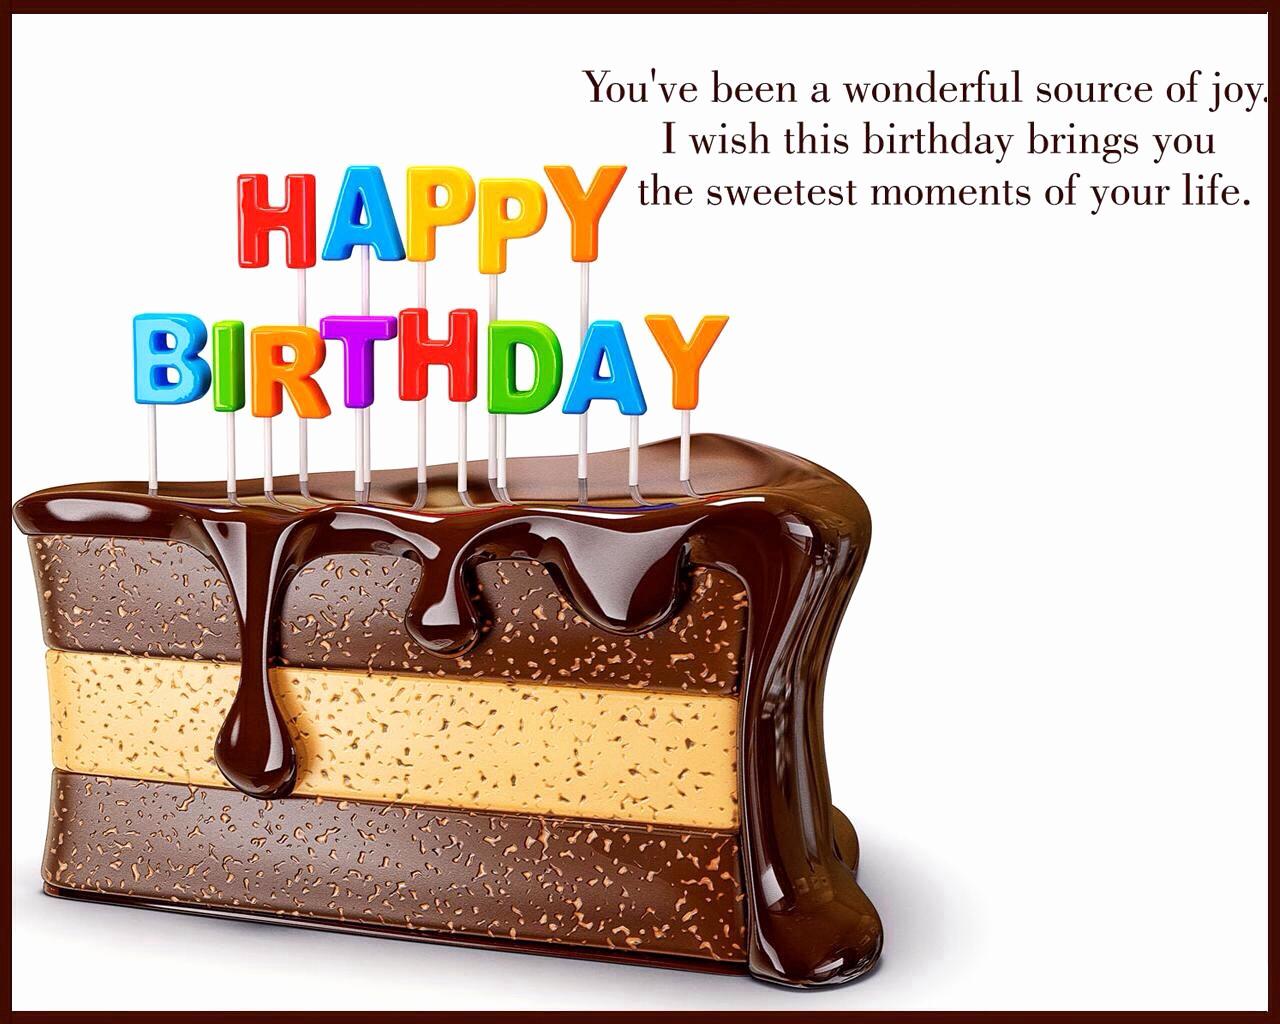 Free Happy Birthday Picture Awesome Открытка с Днем Рождения мужчине на английском языке